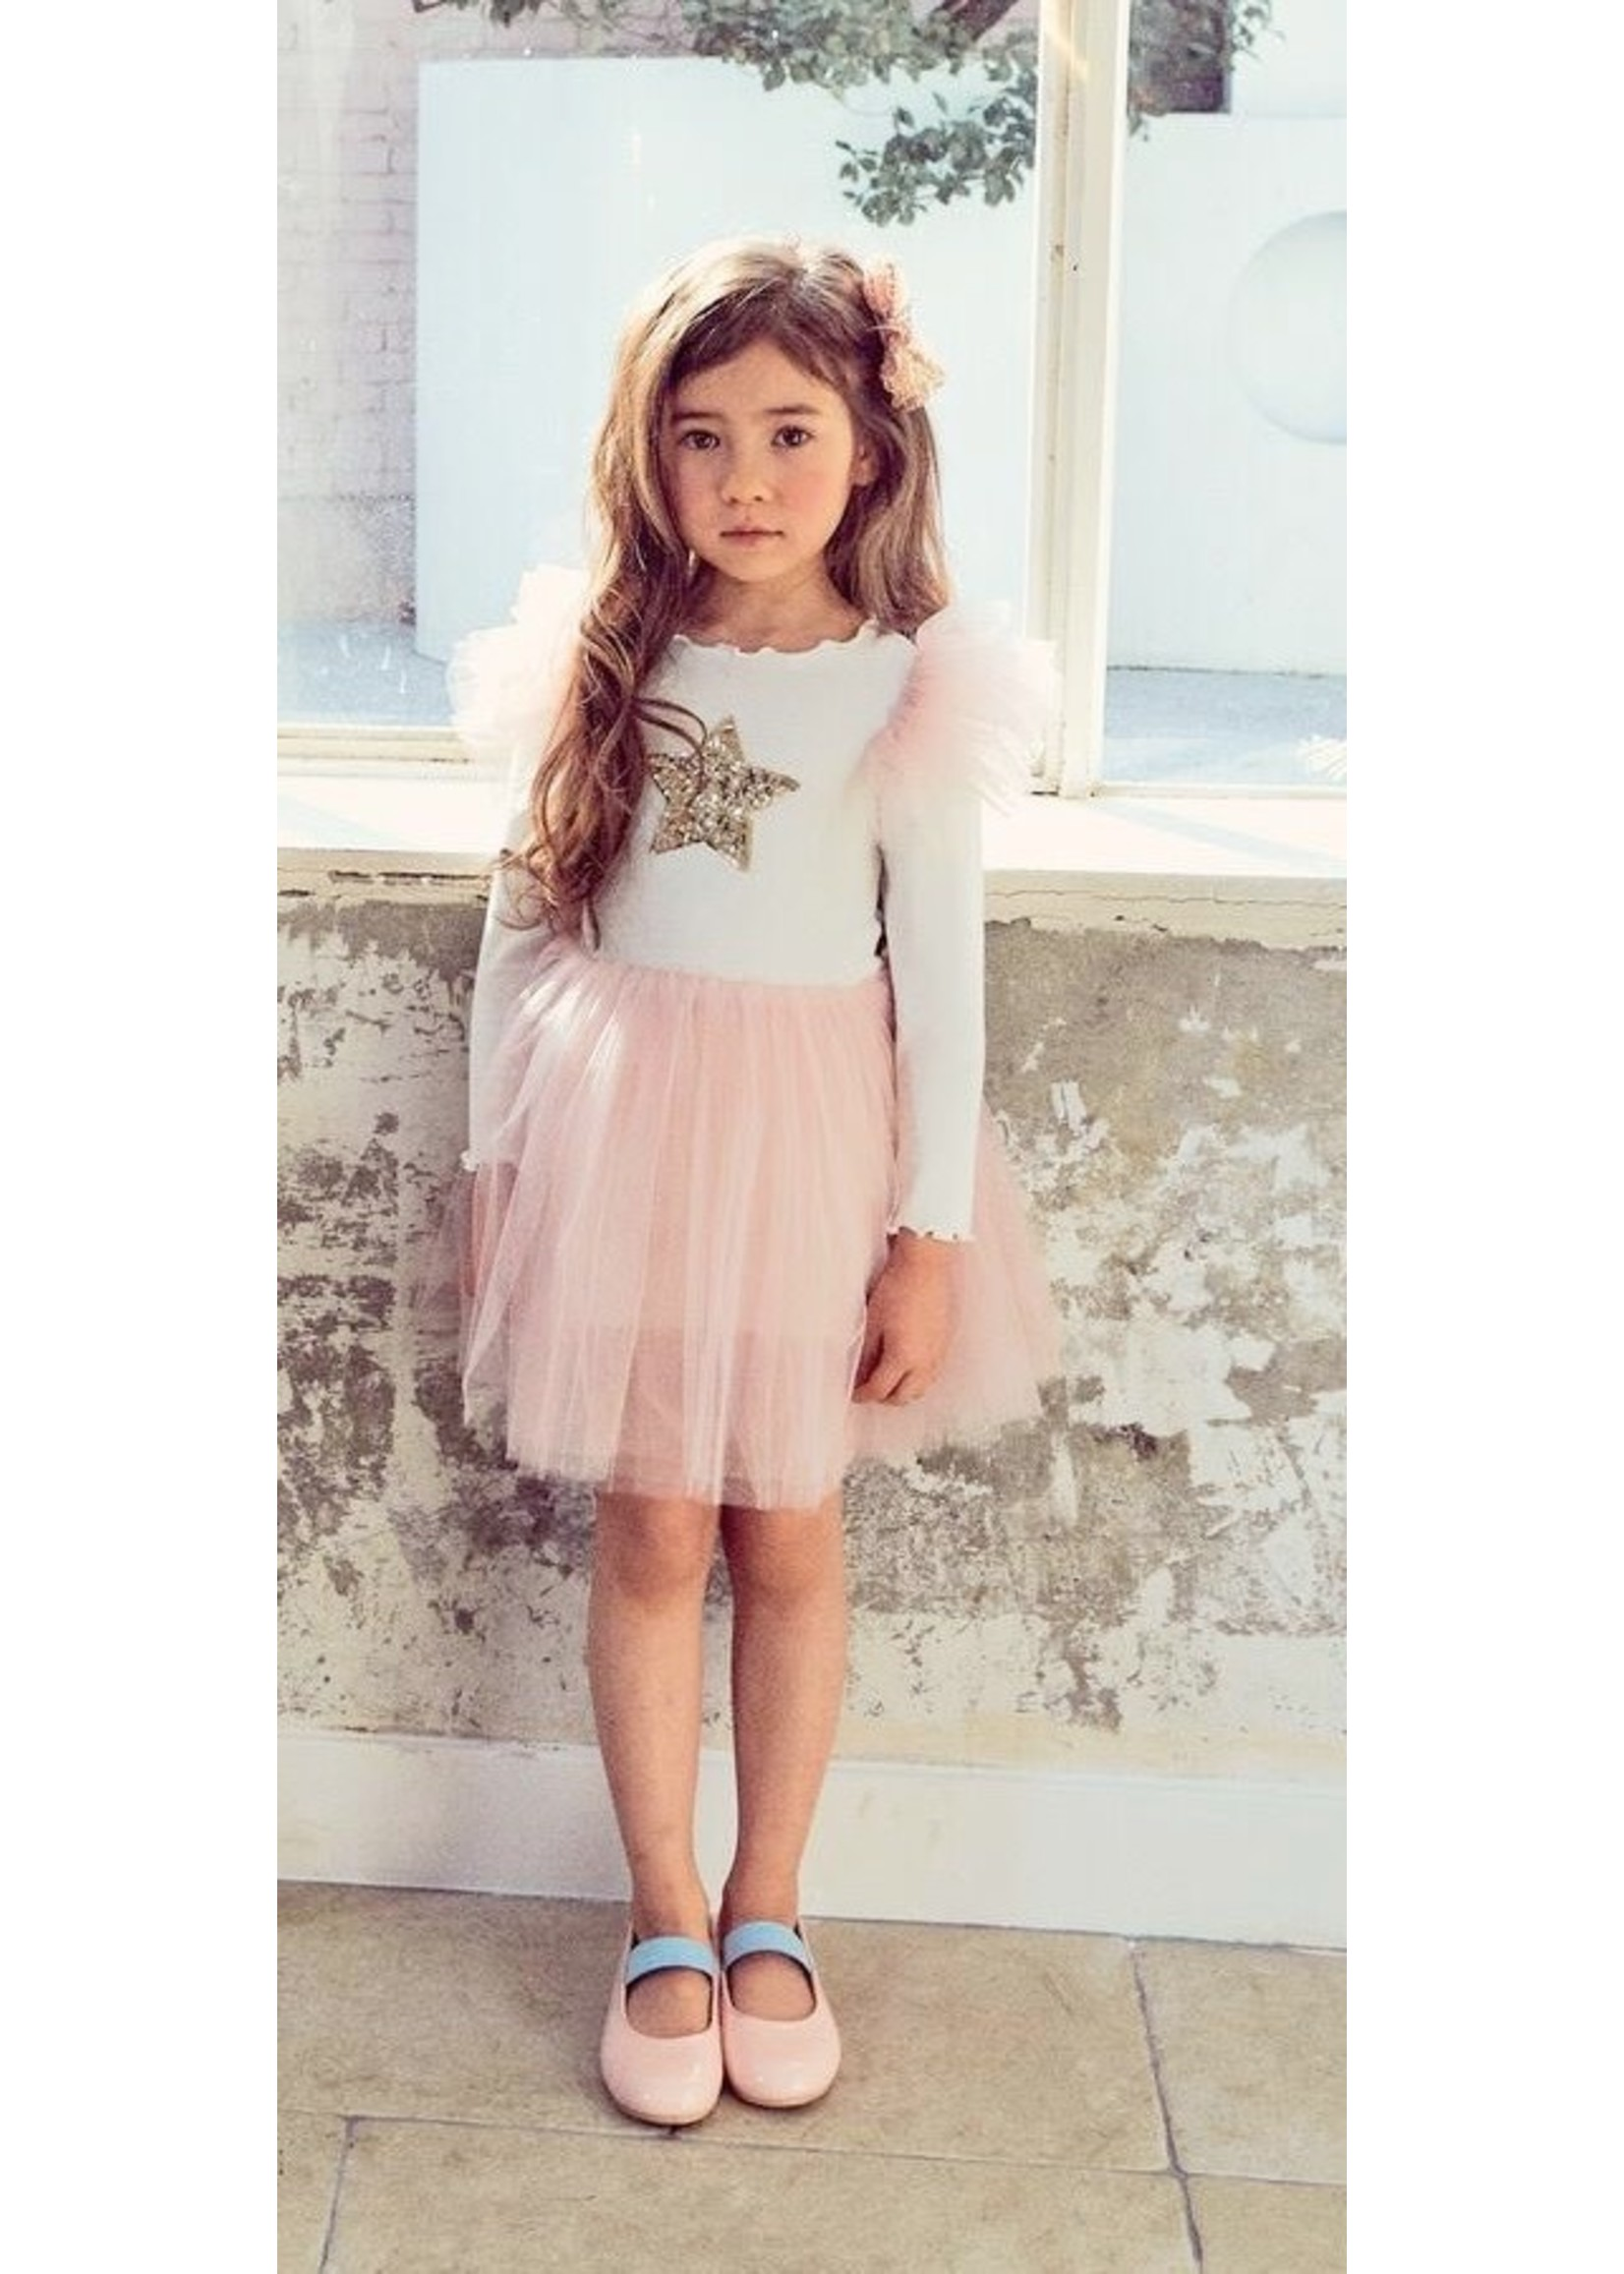 Petite Hailey PH Frill Tutu Dress Pink